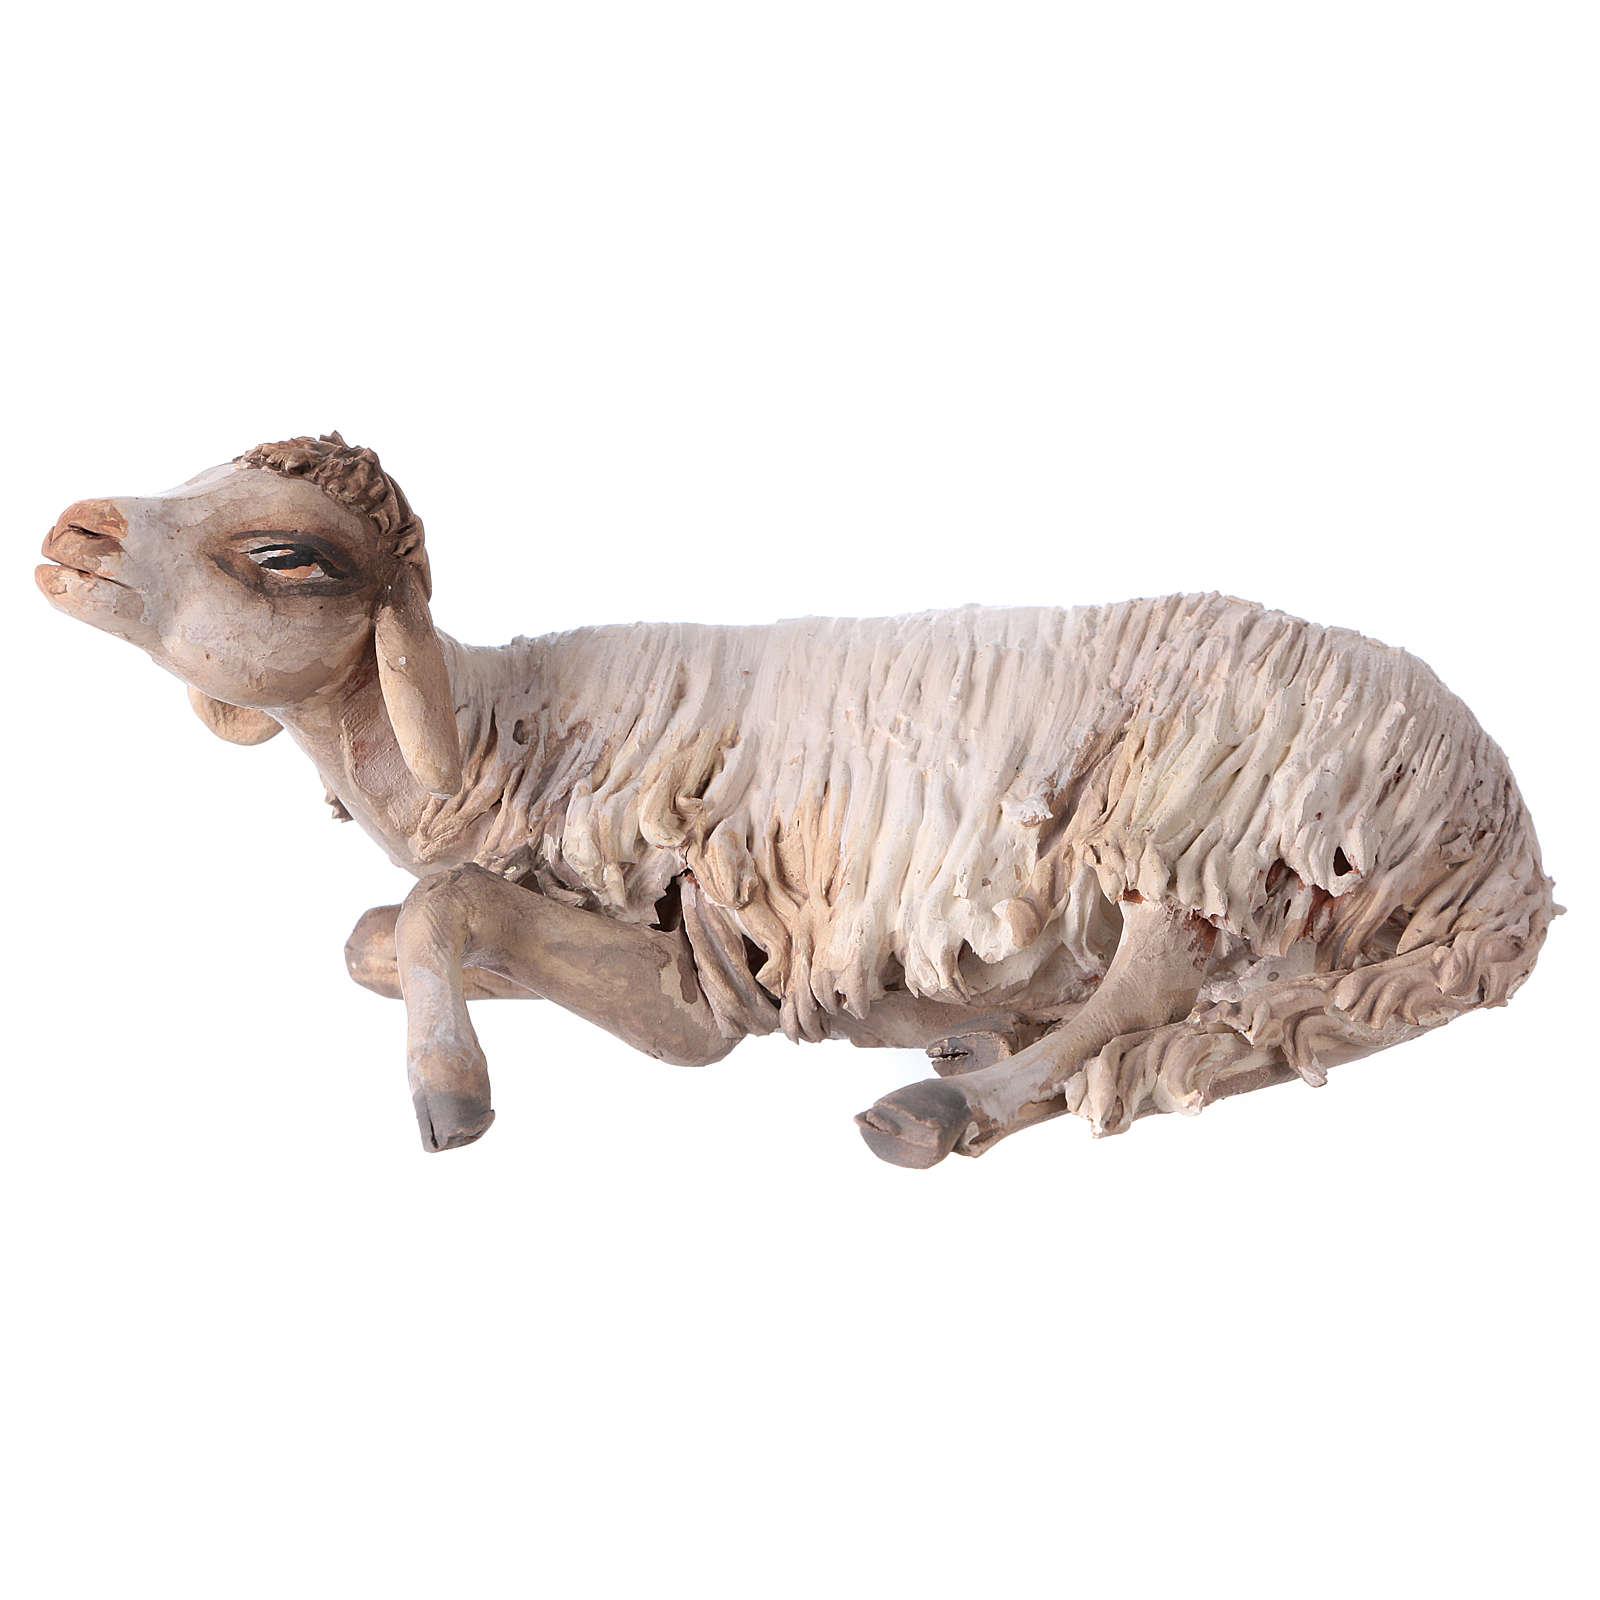 Nativity scene terracotta figurine, sheep 18cm, Angela Tripi 4